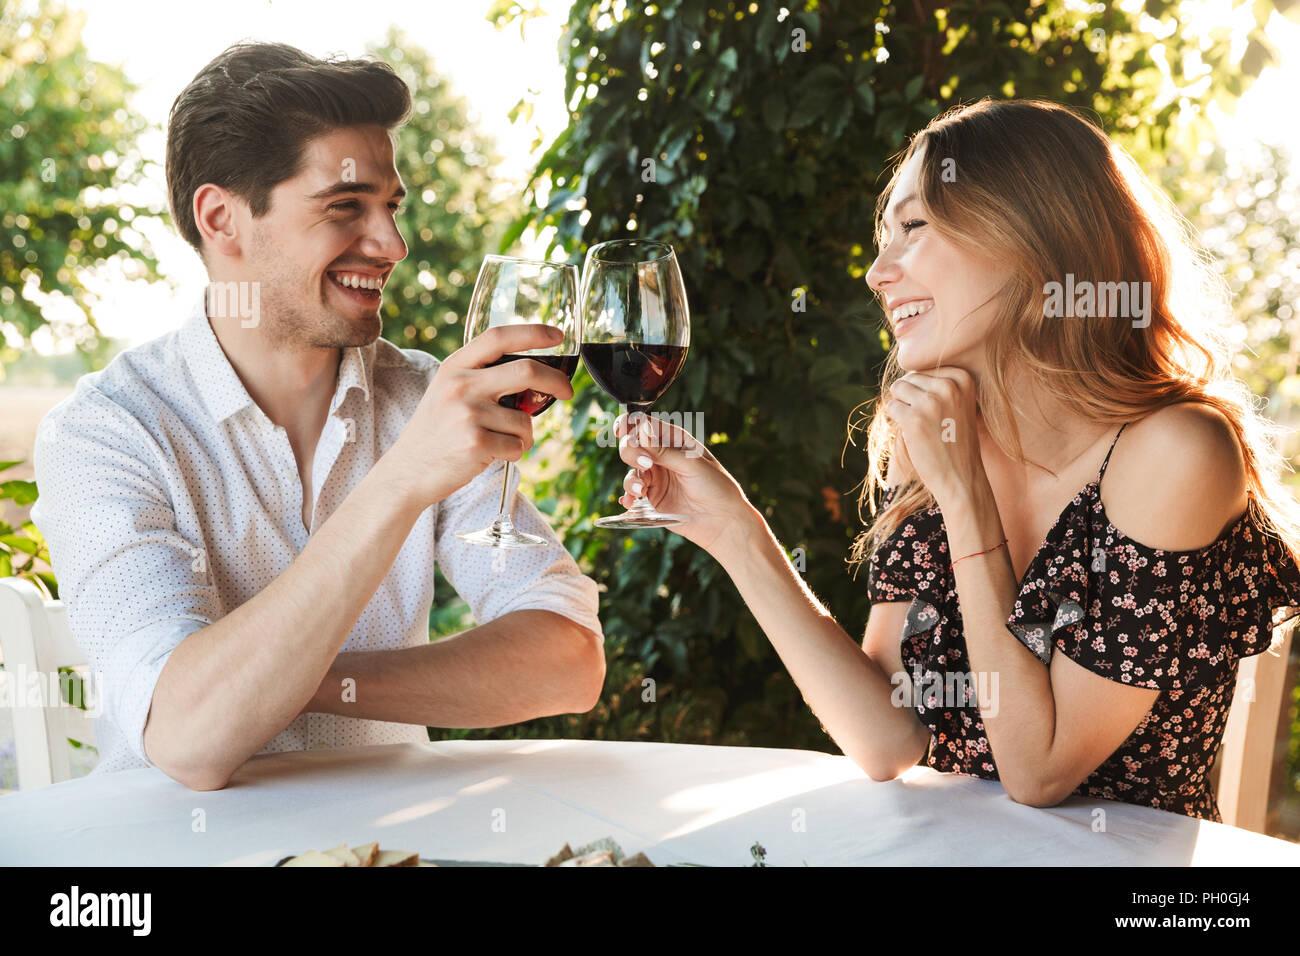 Executive-Dating-Dienst sydney